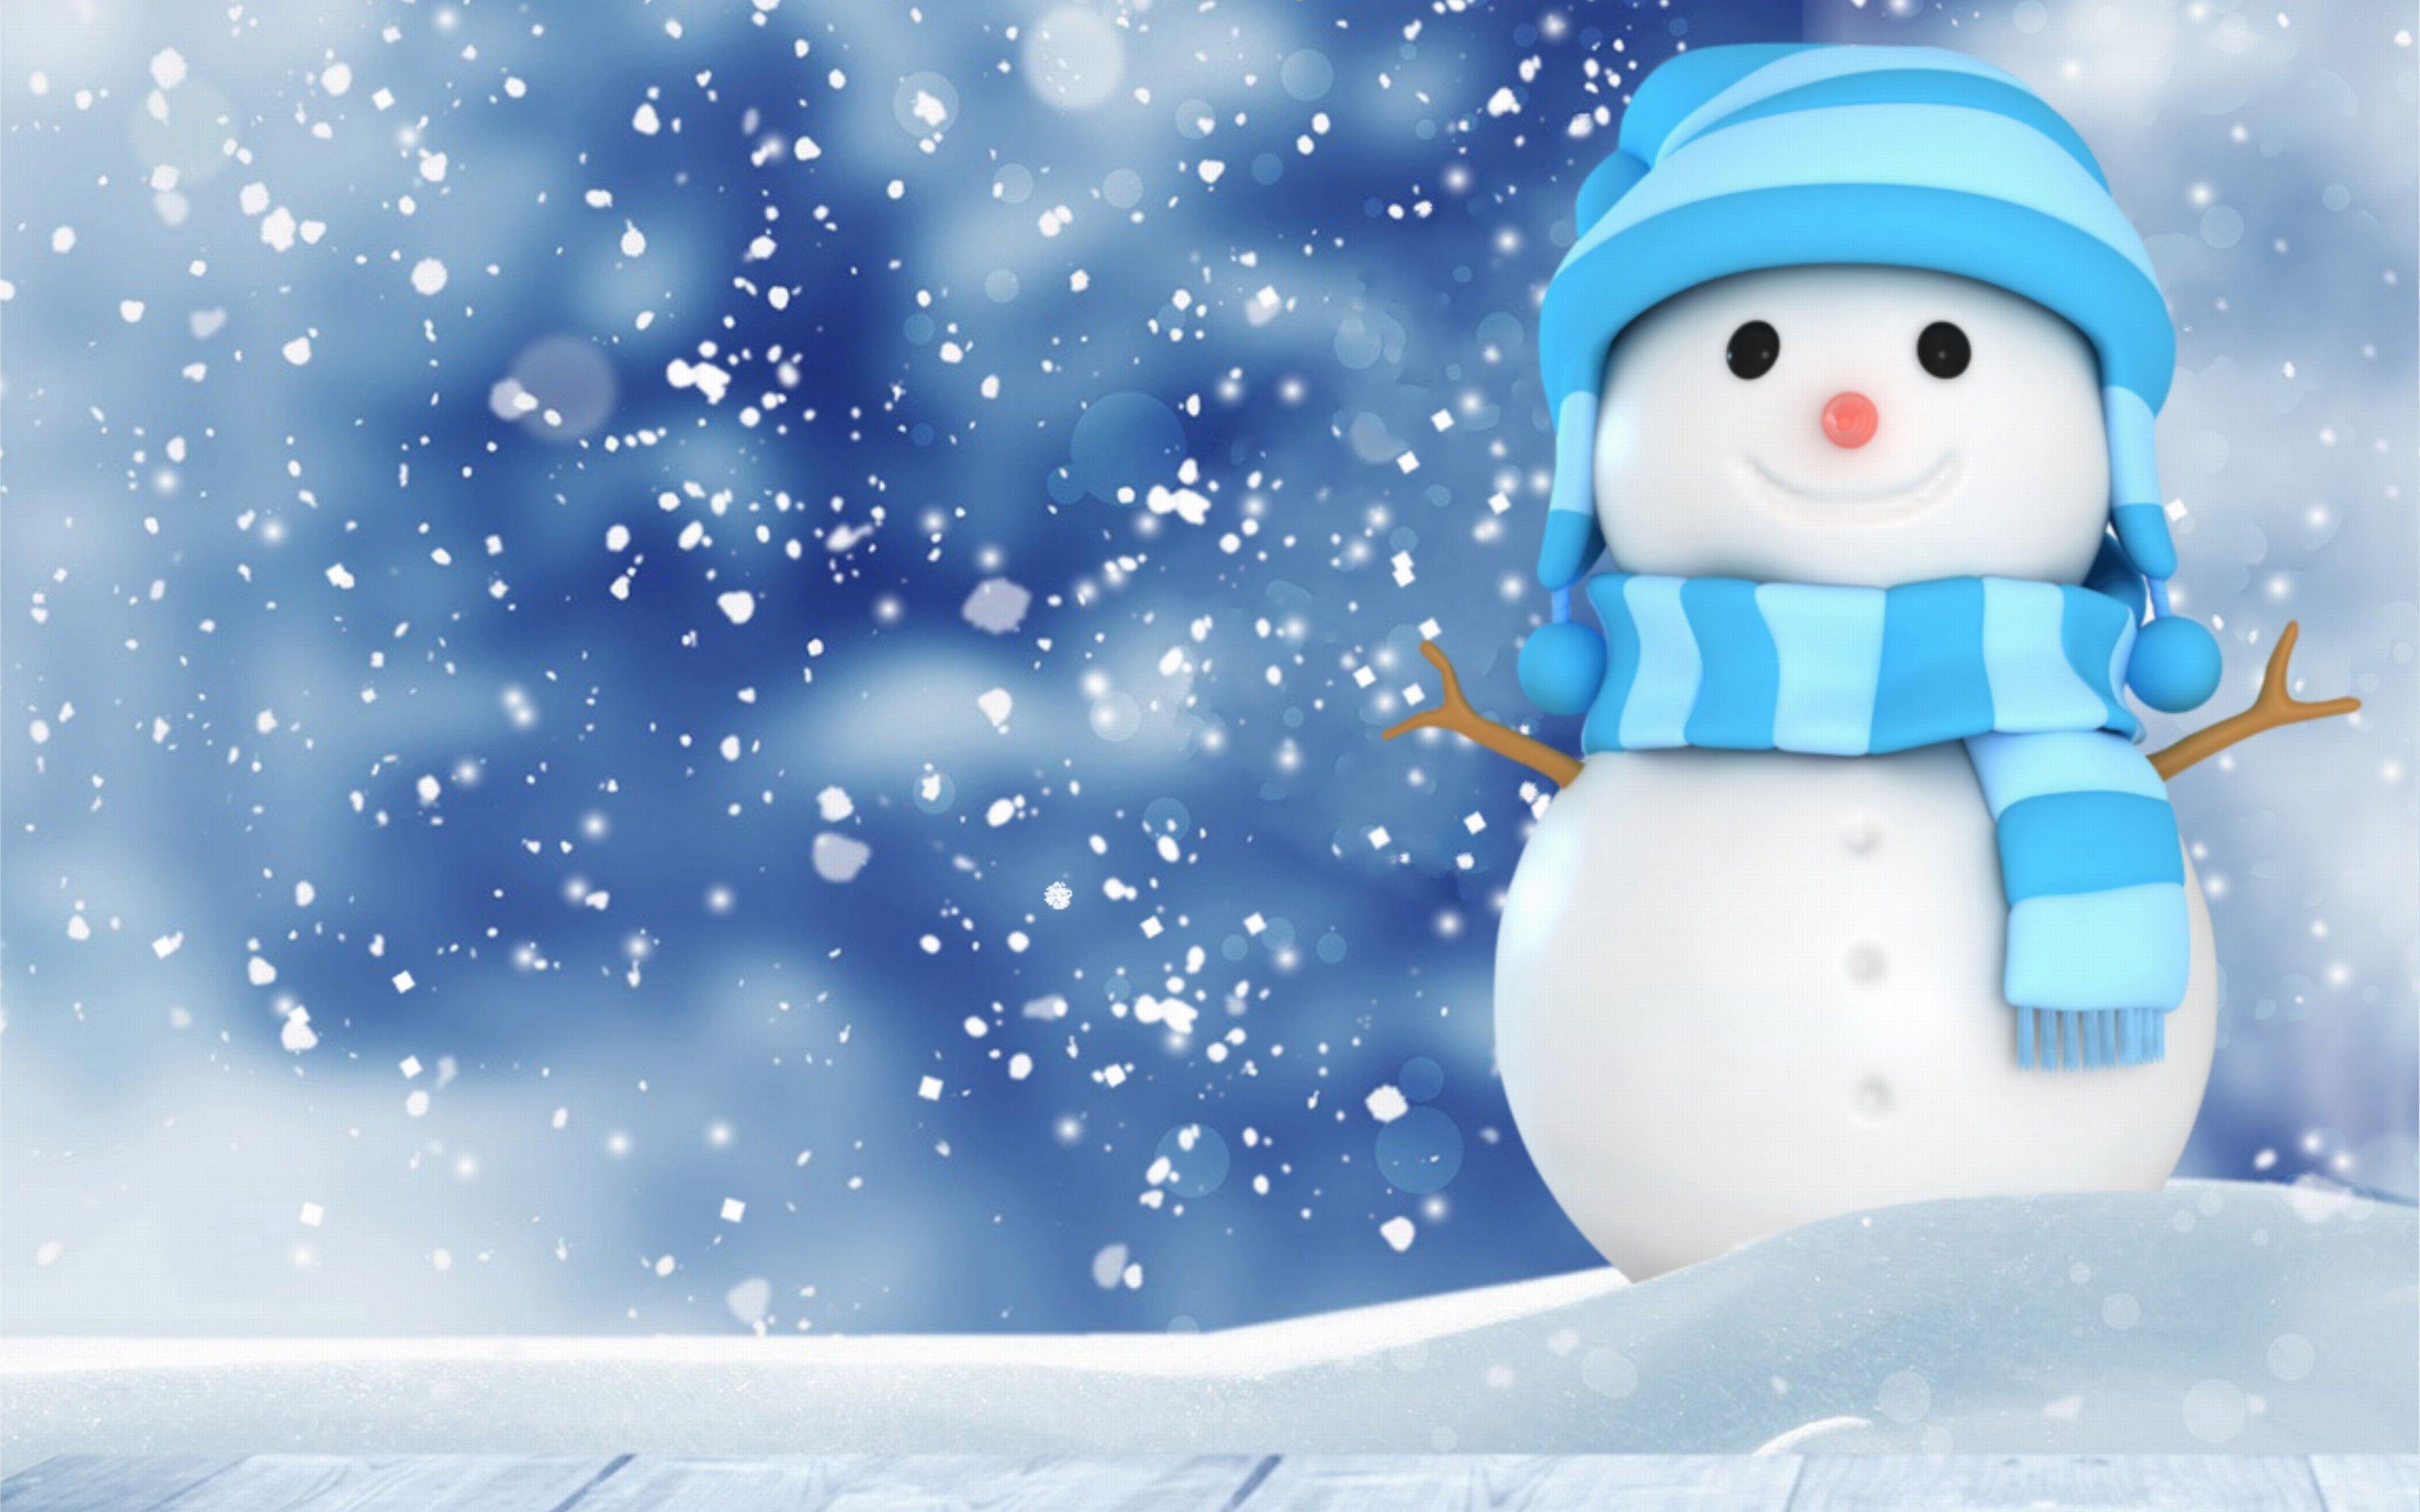 Snowman Wallpaper 25 3840 X 2400 Snowman